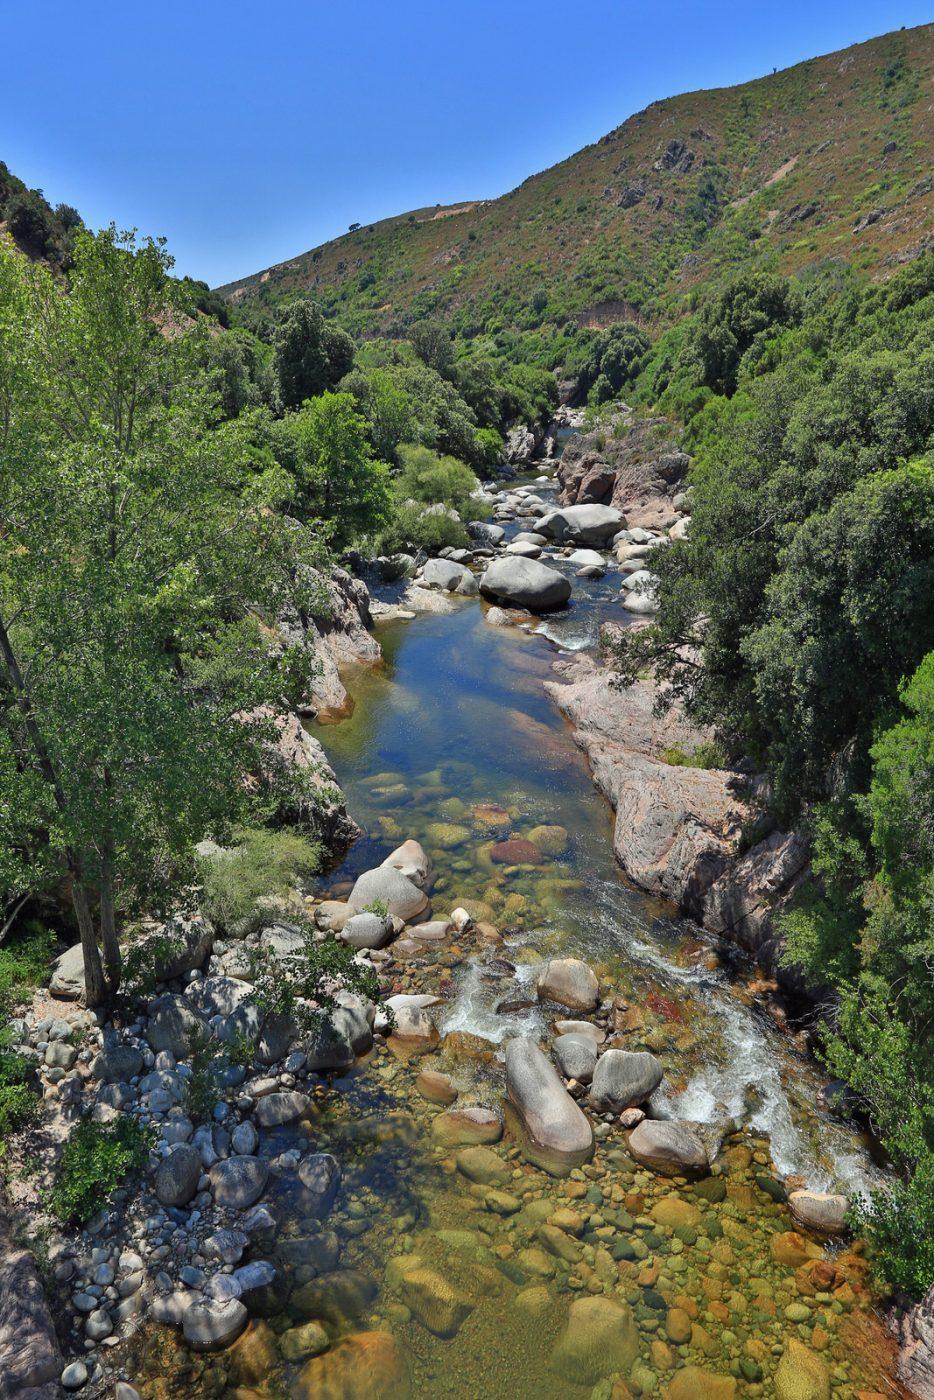 Randonnée aquatique Gravona Corse du Sud